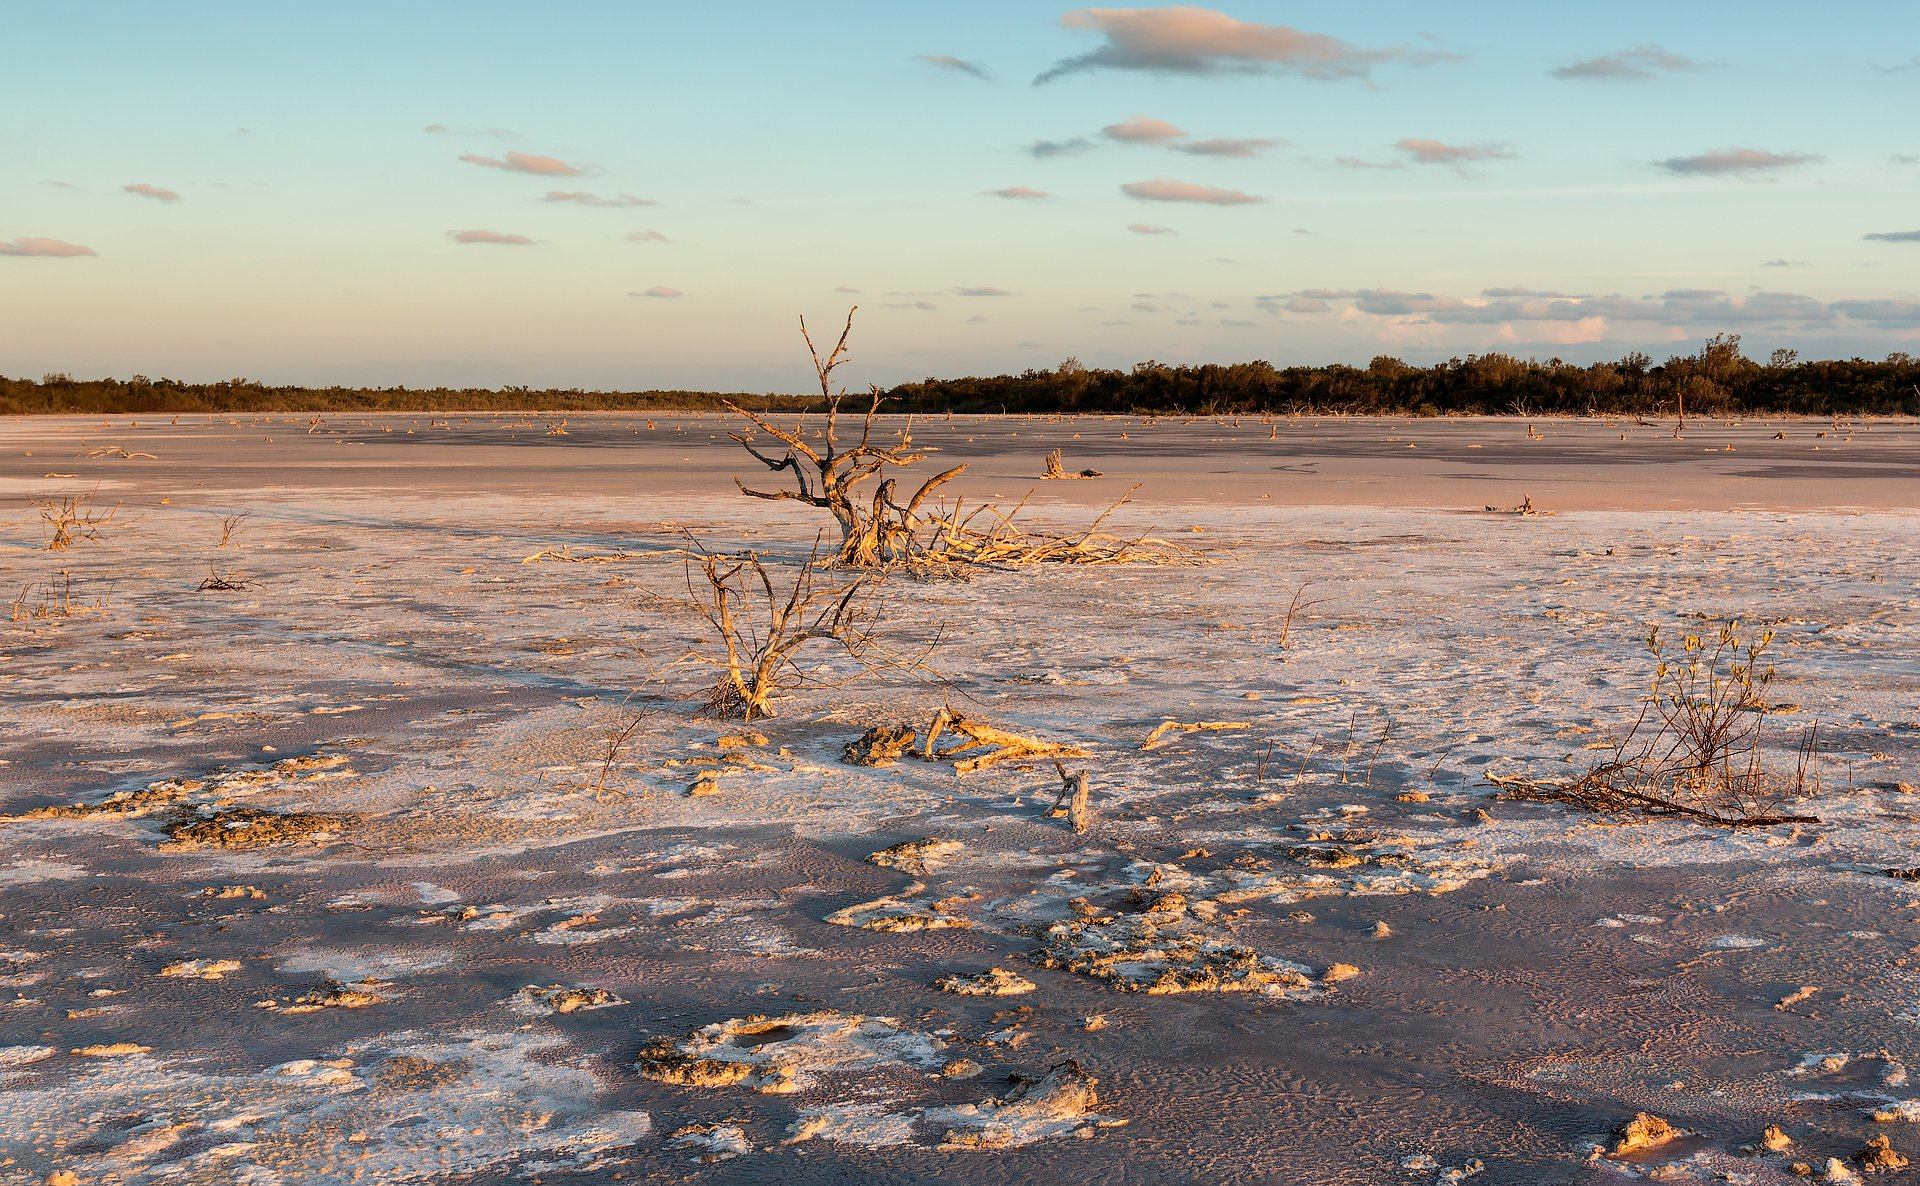 lagoon, salt, trees, sunset, cuba, лагуна, соль, деревья, закат, куба, G A S